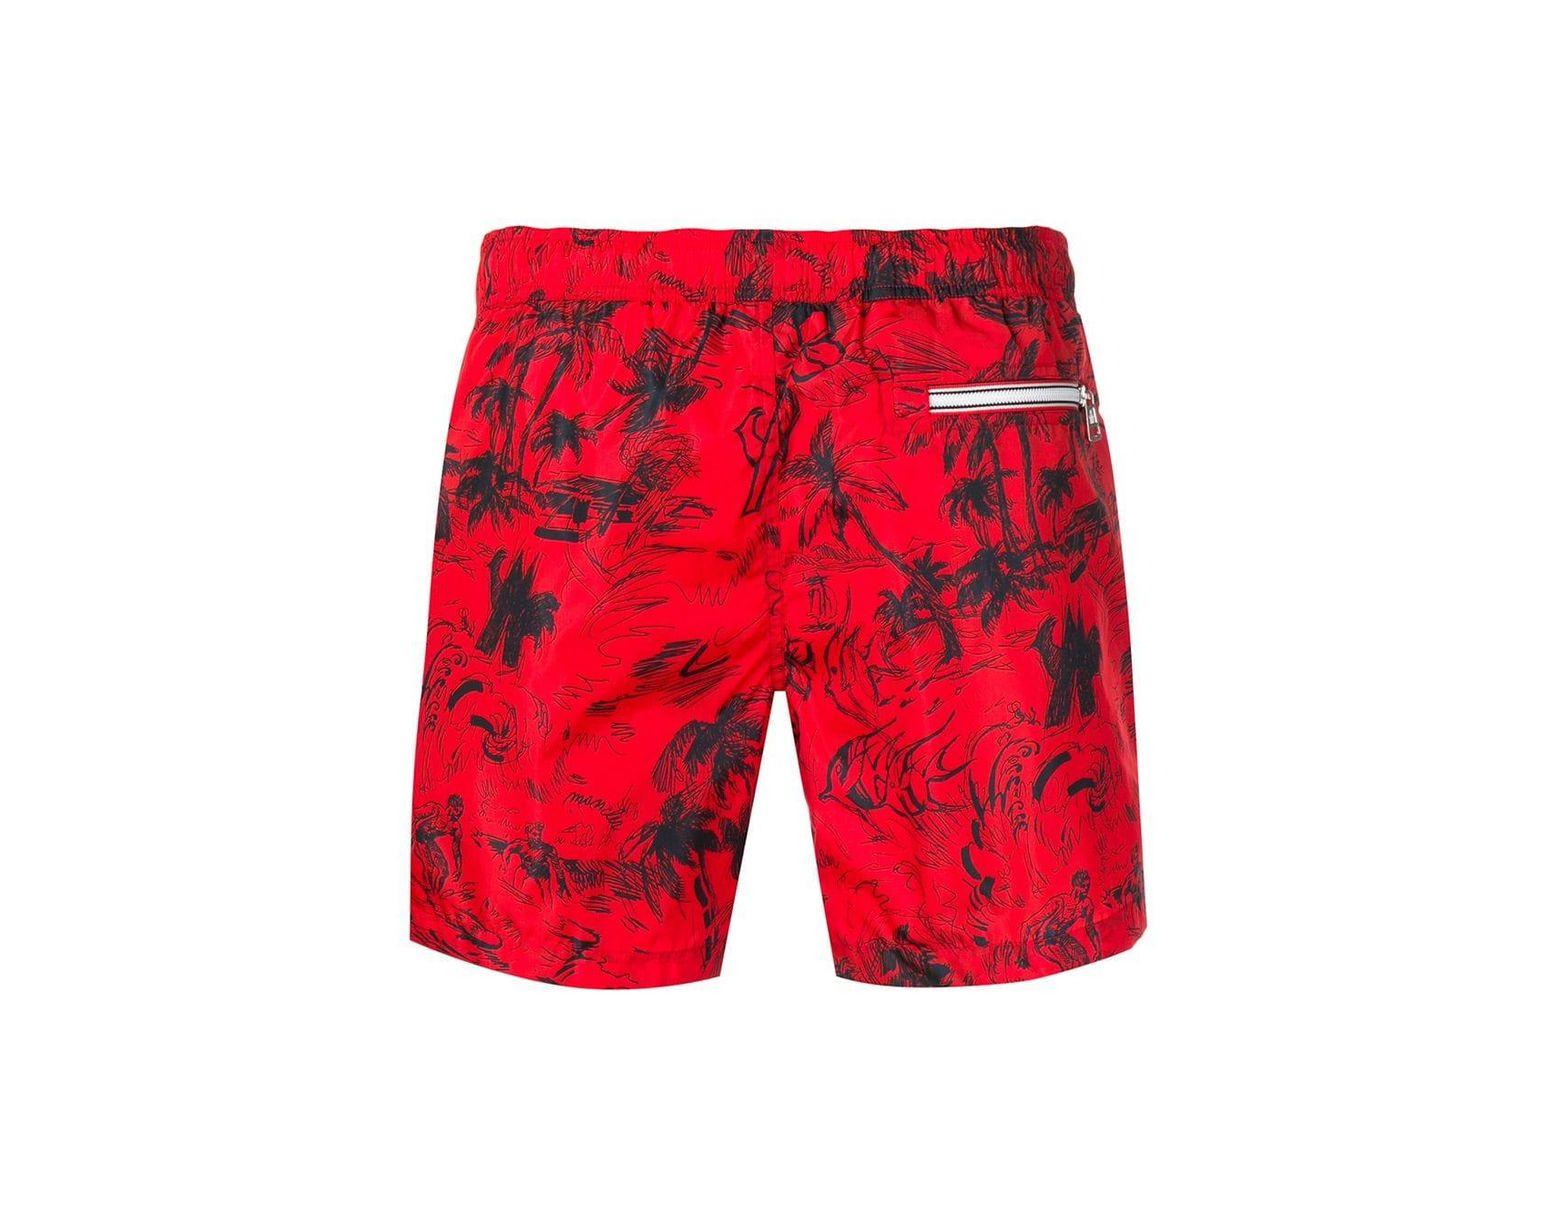 2174c001ec Moncler Scribble Tropical Print Swim Shorts in Red for Men - Lyst